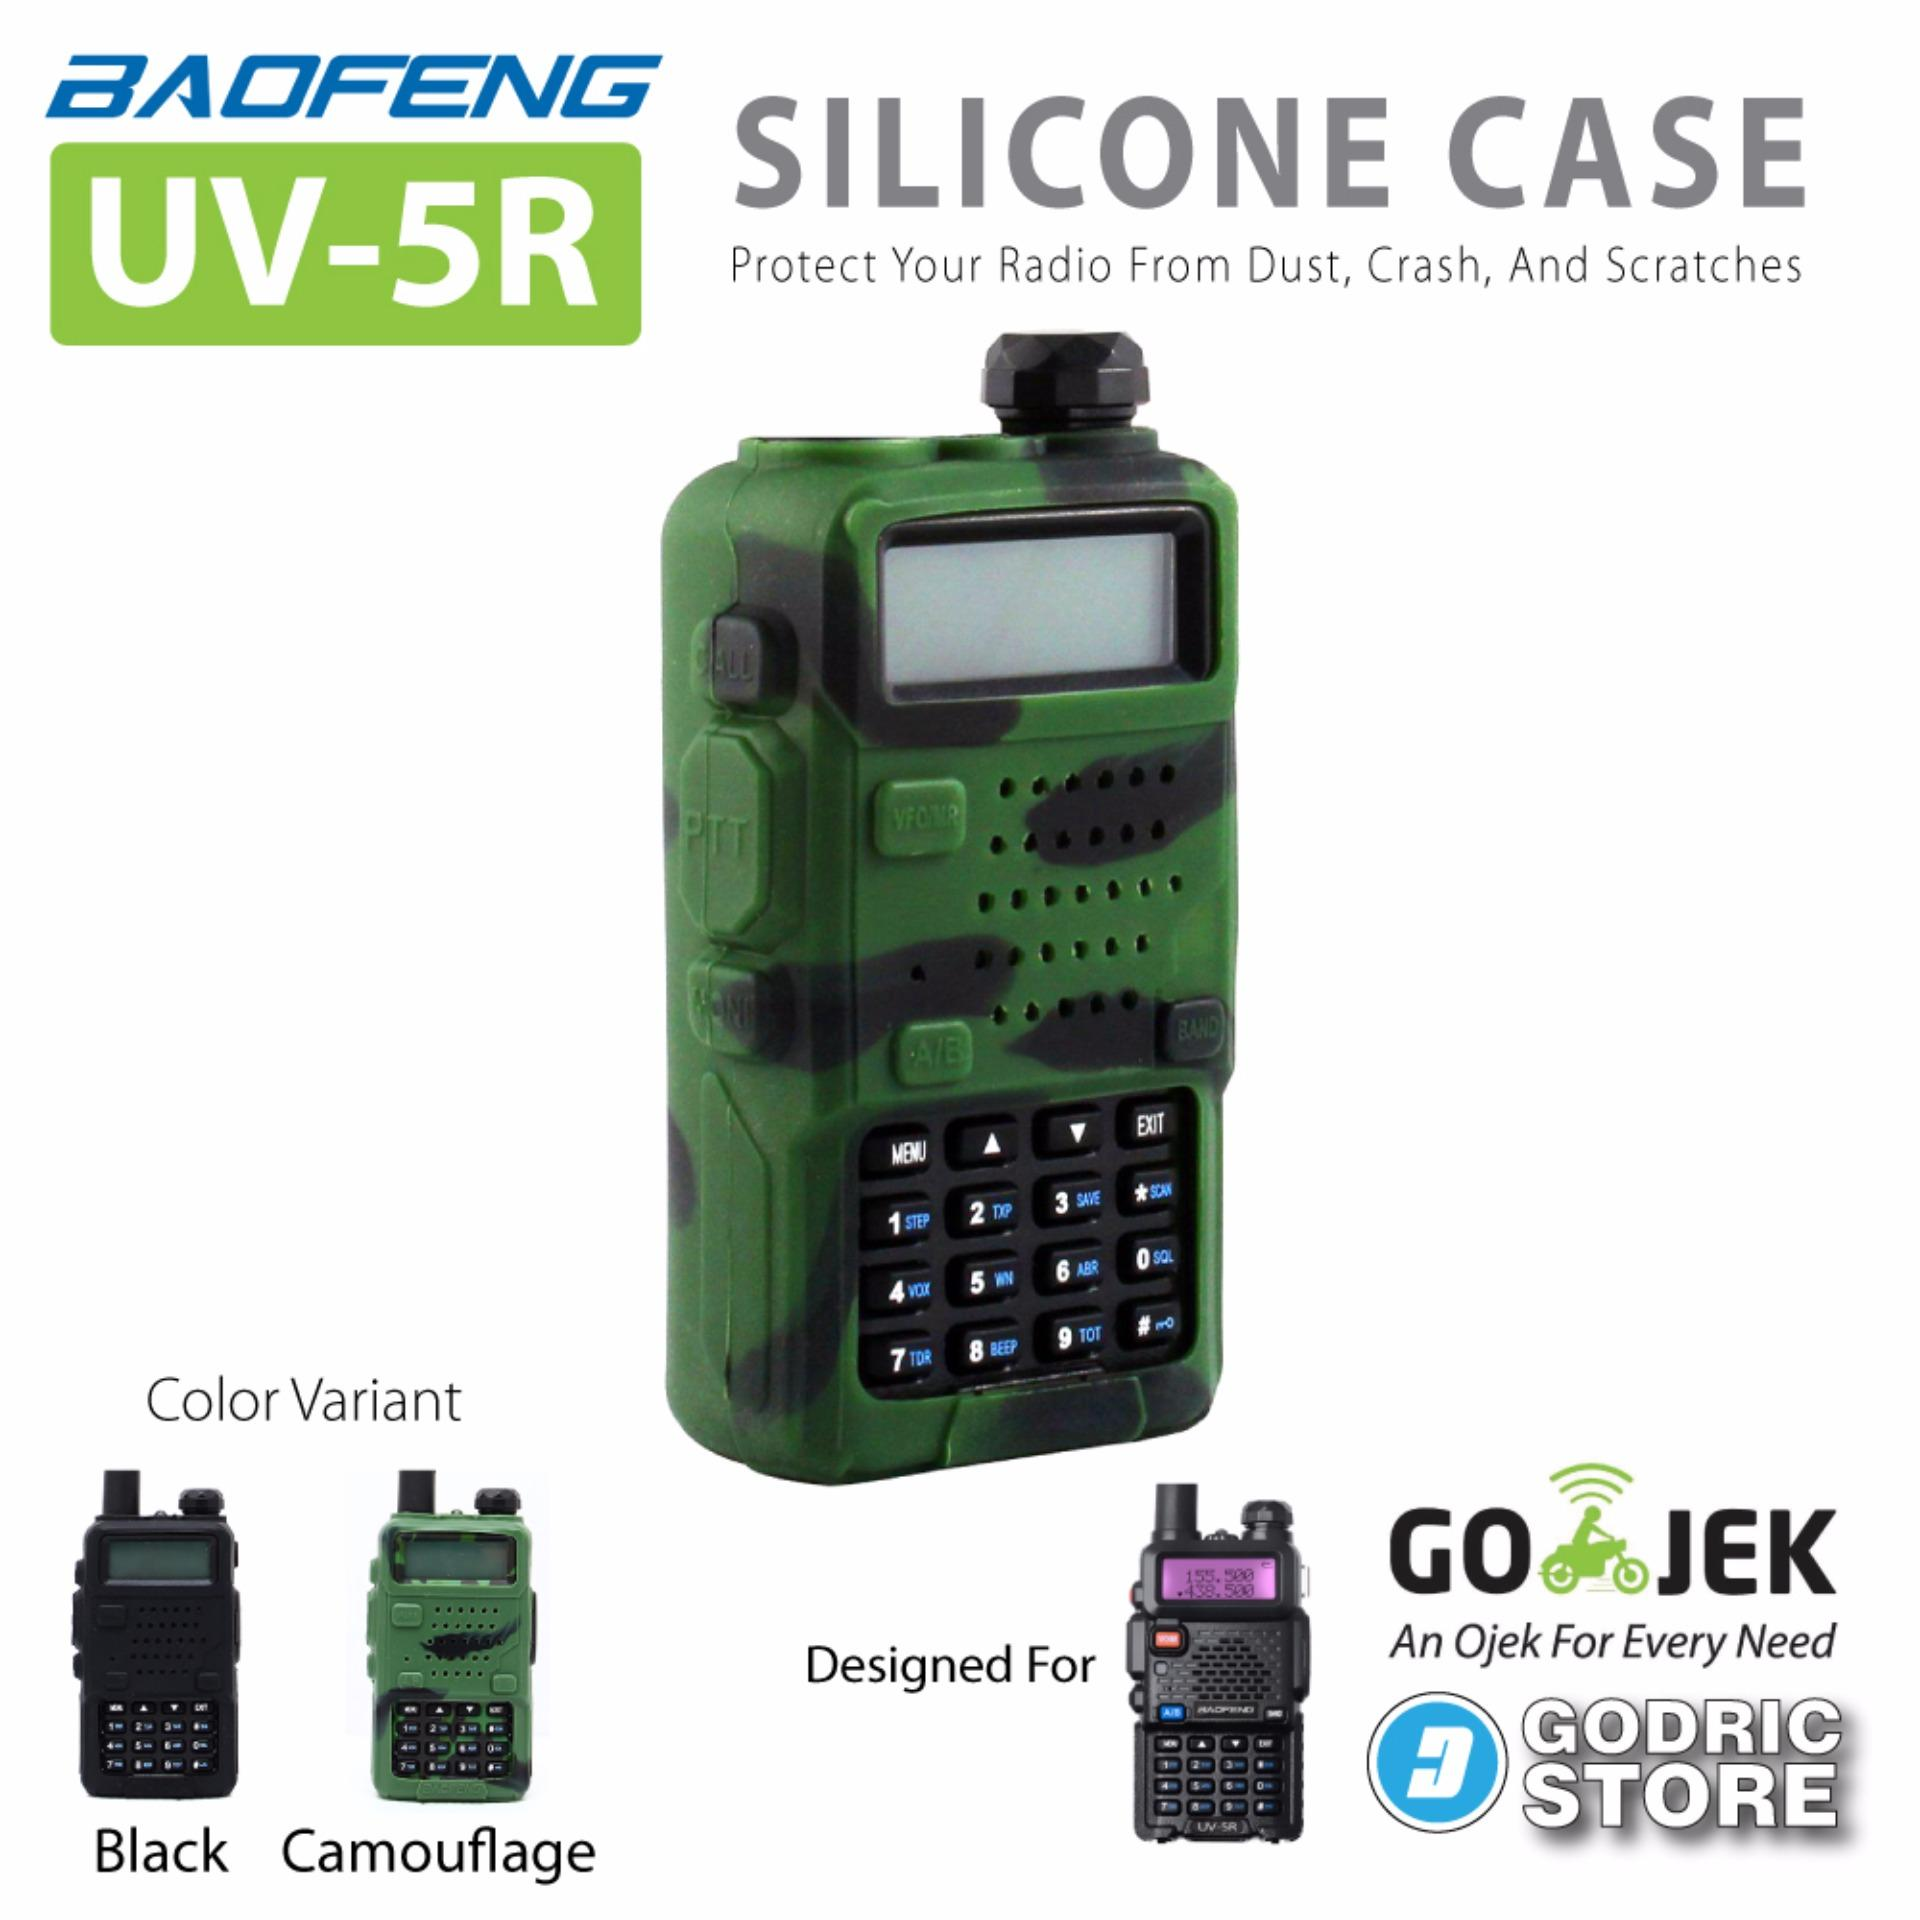 Baofeng UV-5R Silicone Case / Sarung Silicon - Camouflage